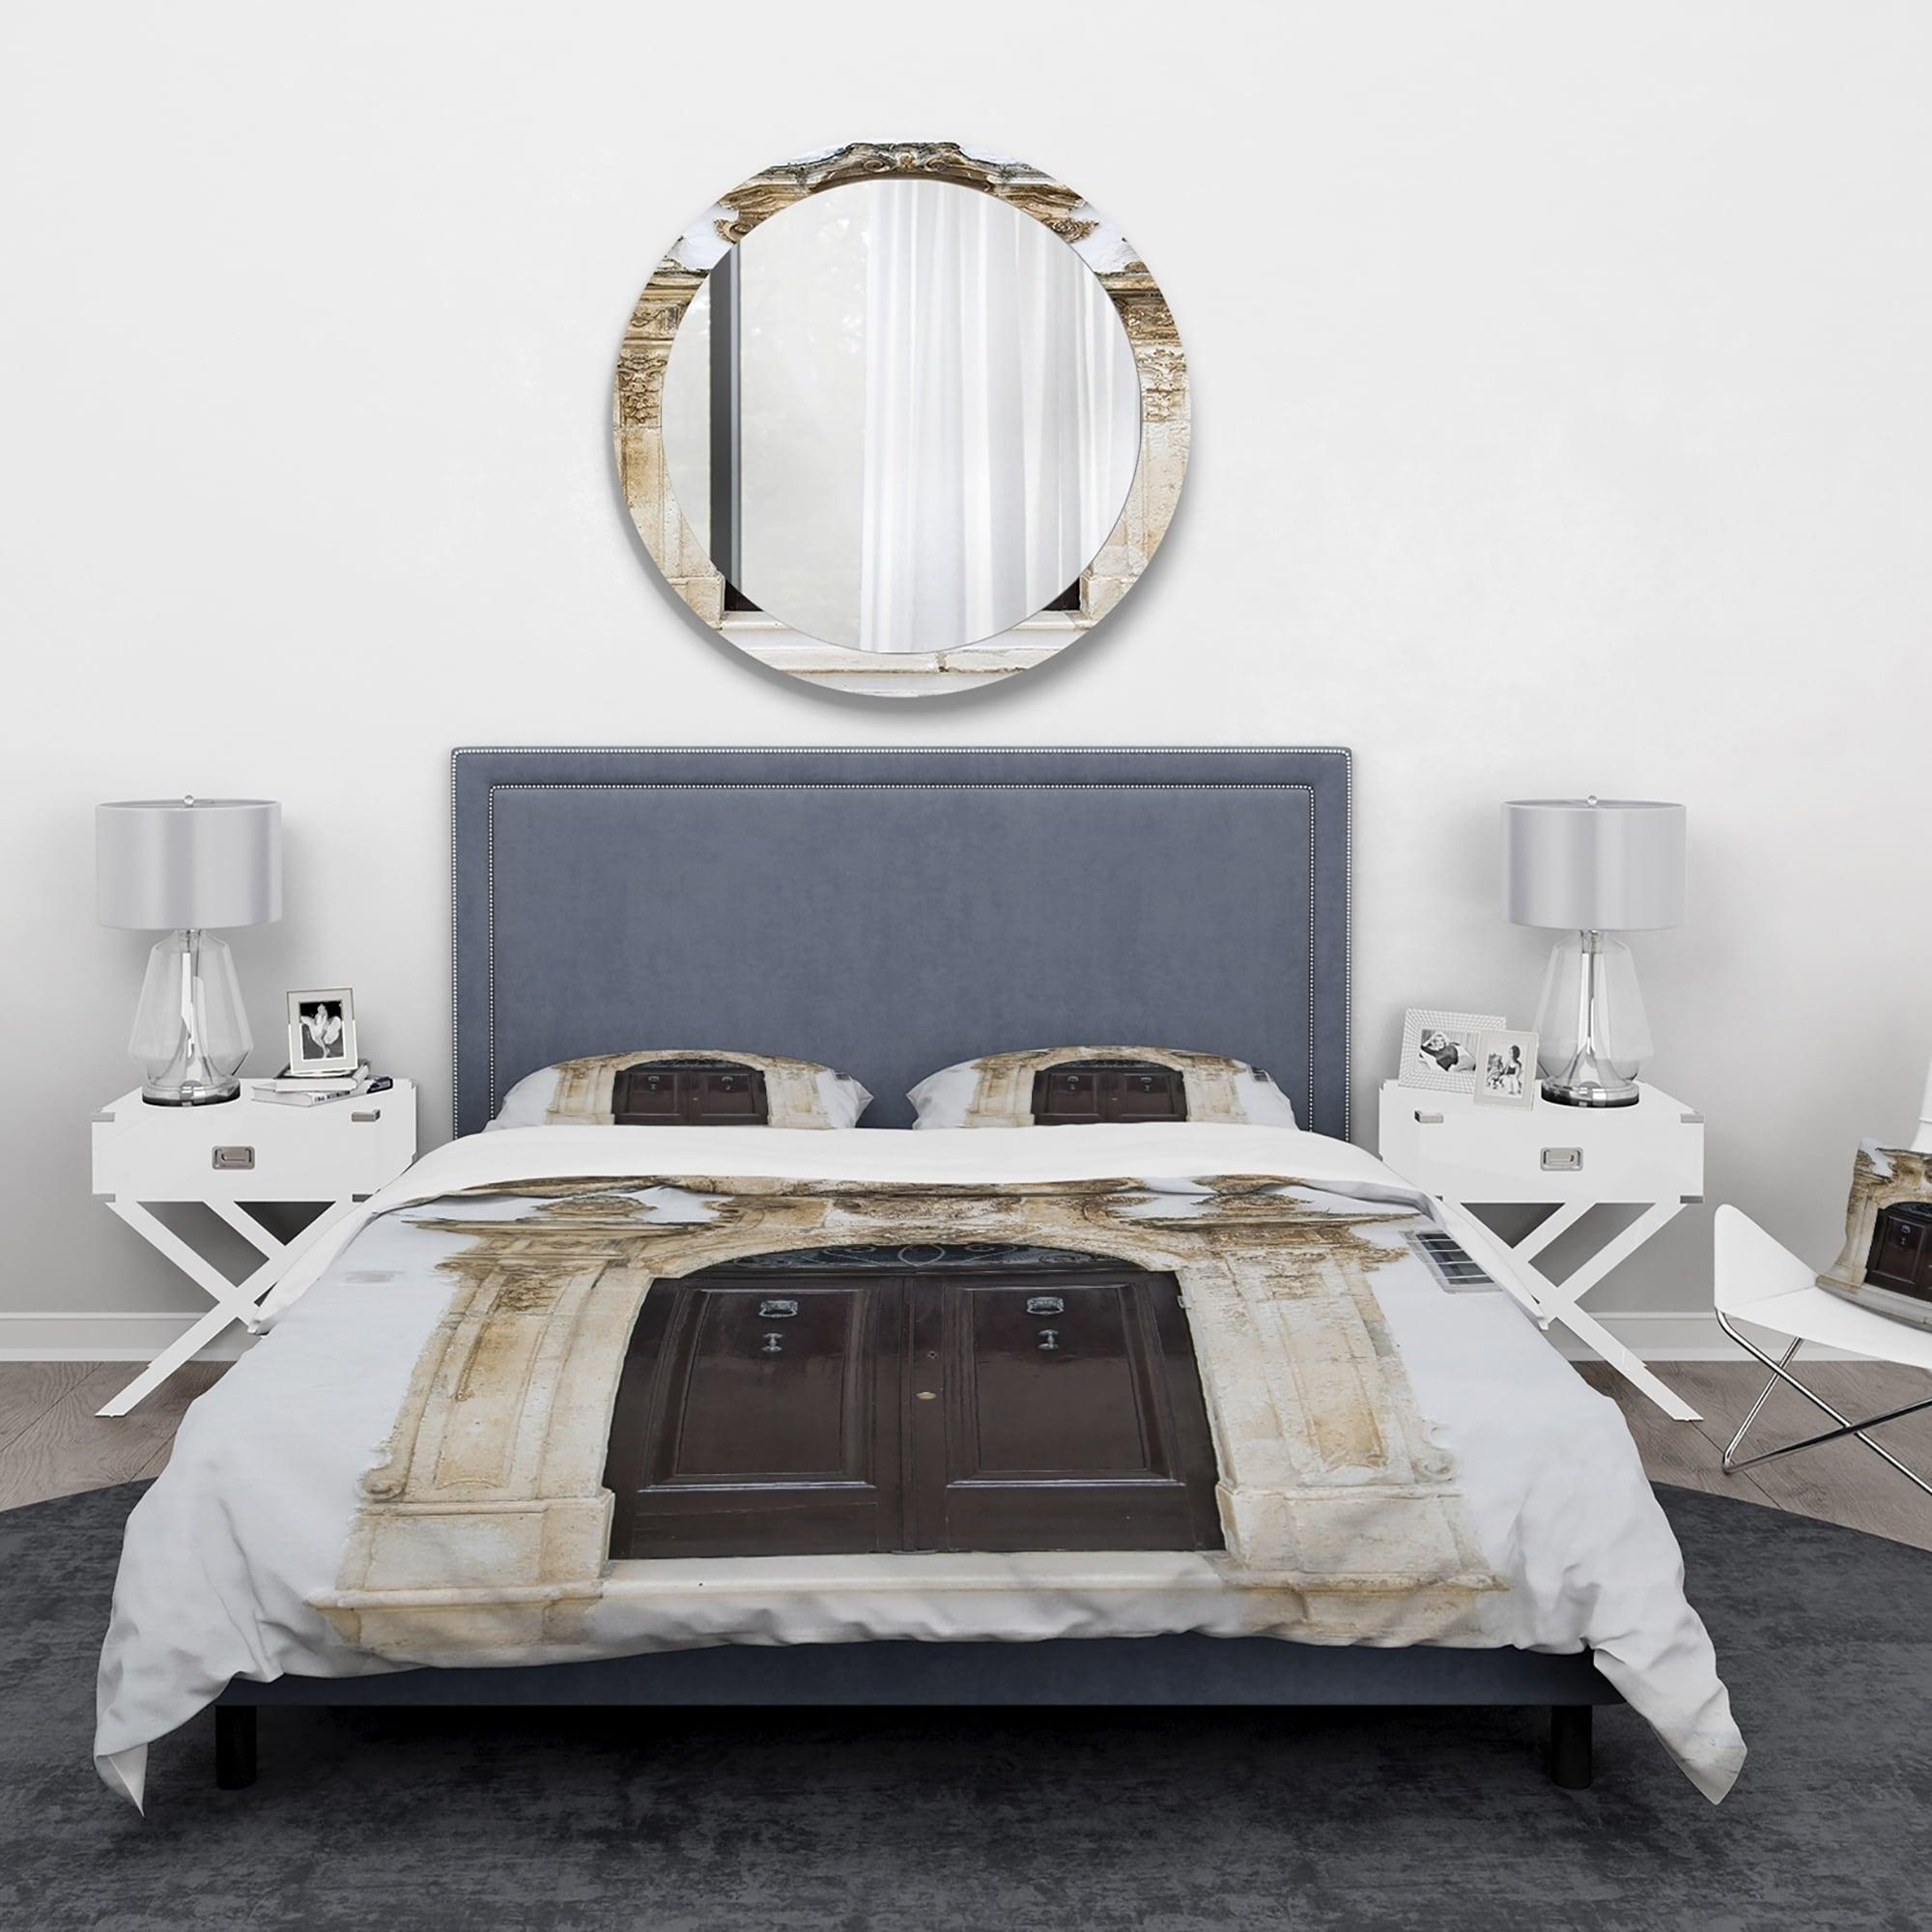 Designart Old Door Bari Italy Vintage Bedding Set Duvet Cover Shams On Sale Overstock 24240422